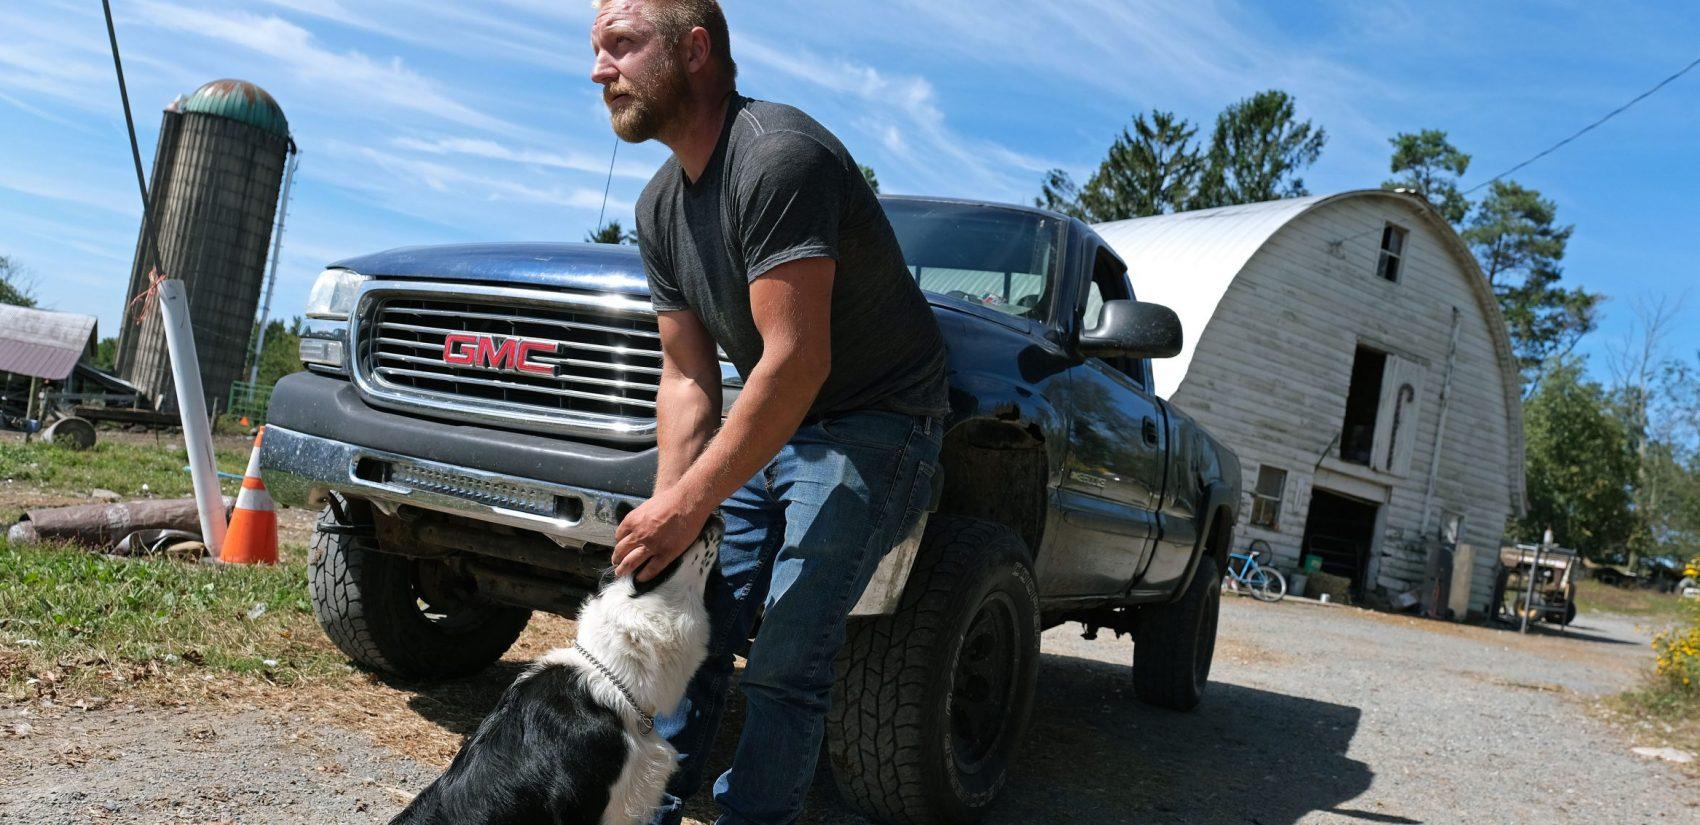 Grain farmer Jesse Poliskiewicz pets a dog while visiting his father's farm Sept. 20, 2019, in Upper Mount Bethel Township, Pennsylvania. (Matt Smith for Keystone Crossroads)